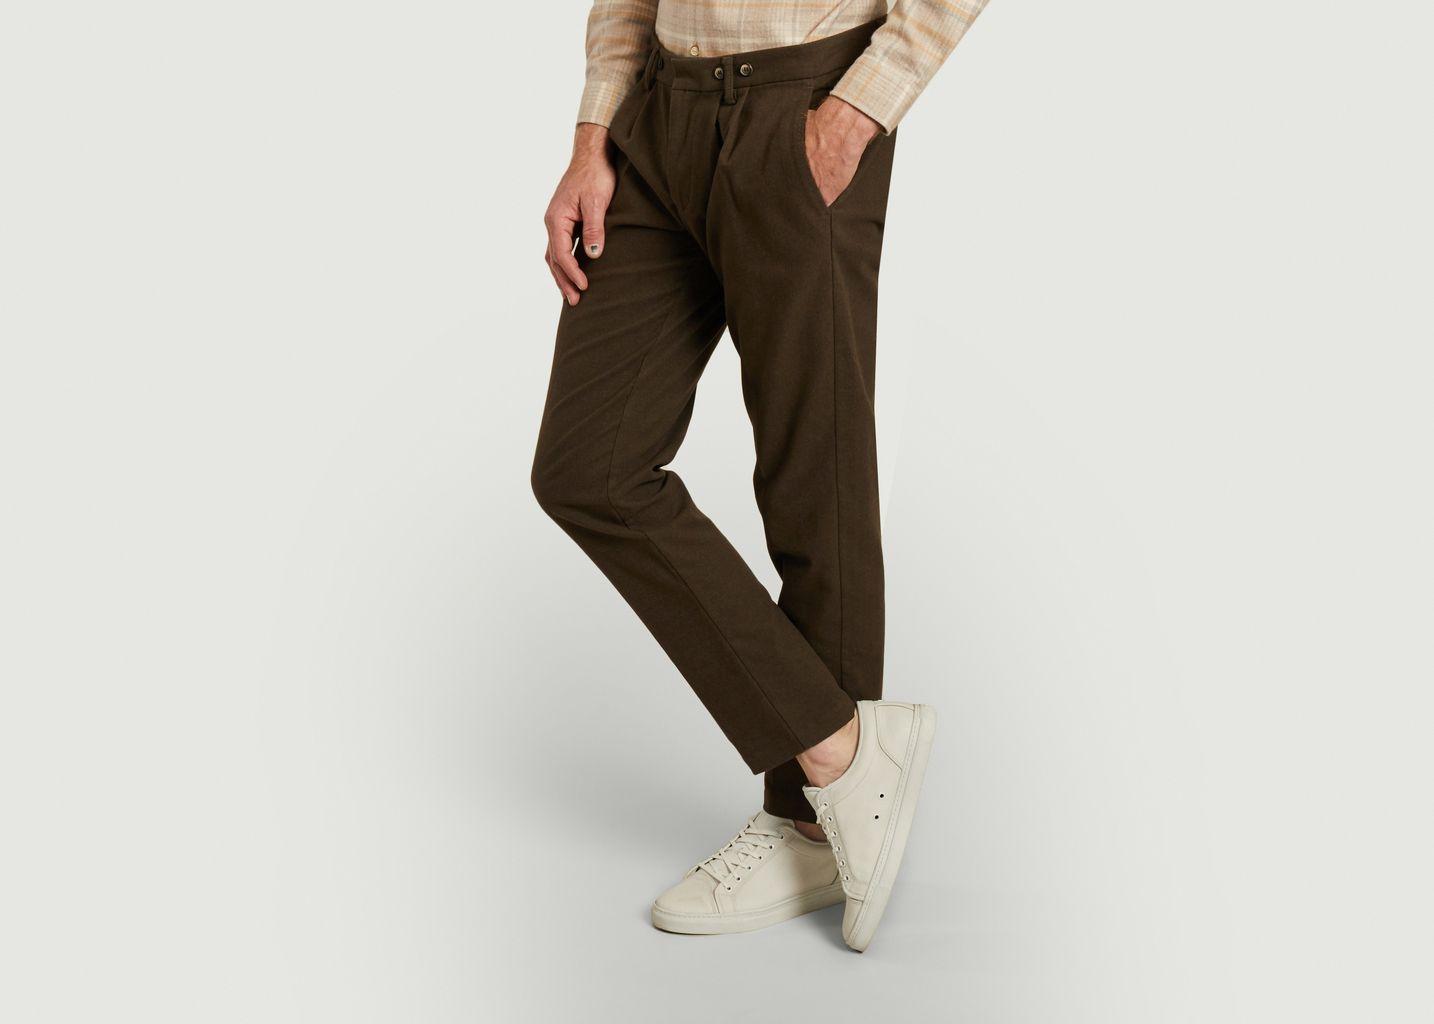 Pantalon City  - JagVi Rive Gauche